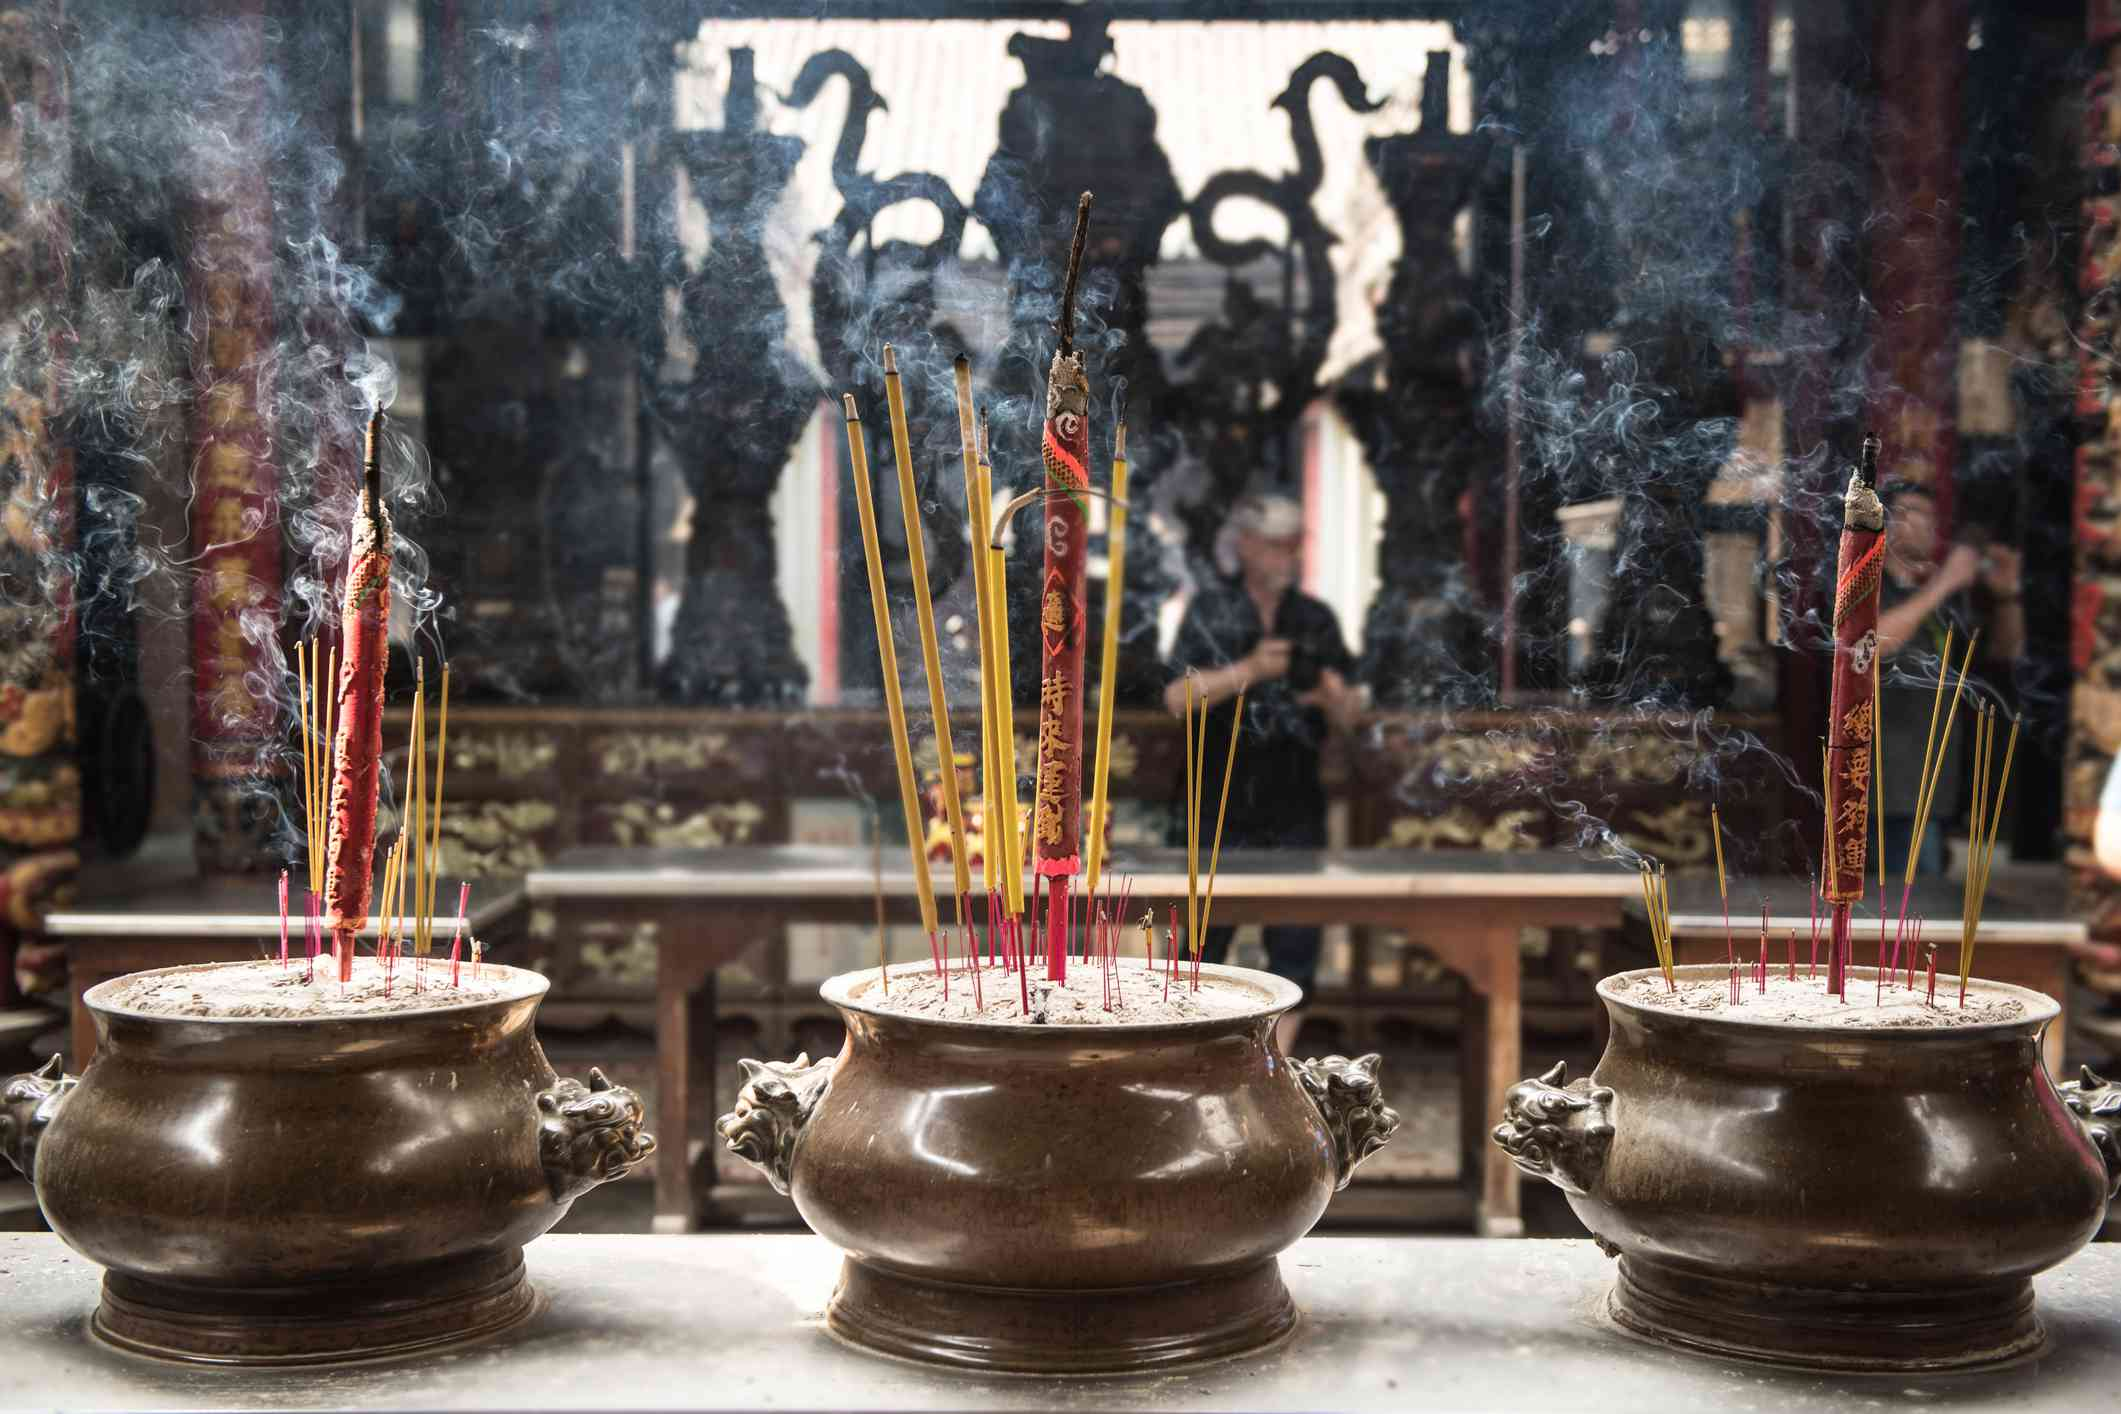 Smoking prayer sticks in copper urns. Thien Hau Pagoda, Ho Chi Minh, Vietnam.